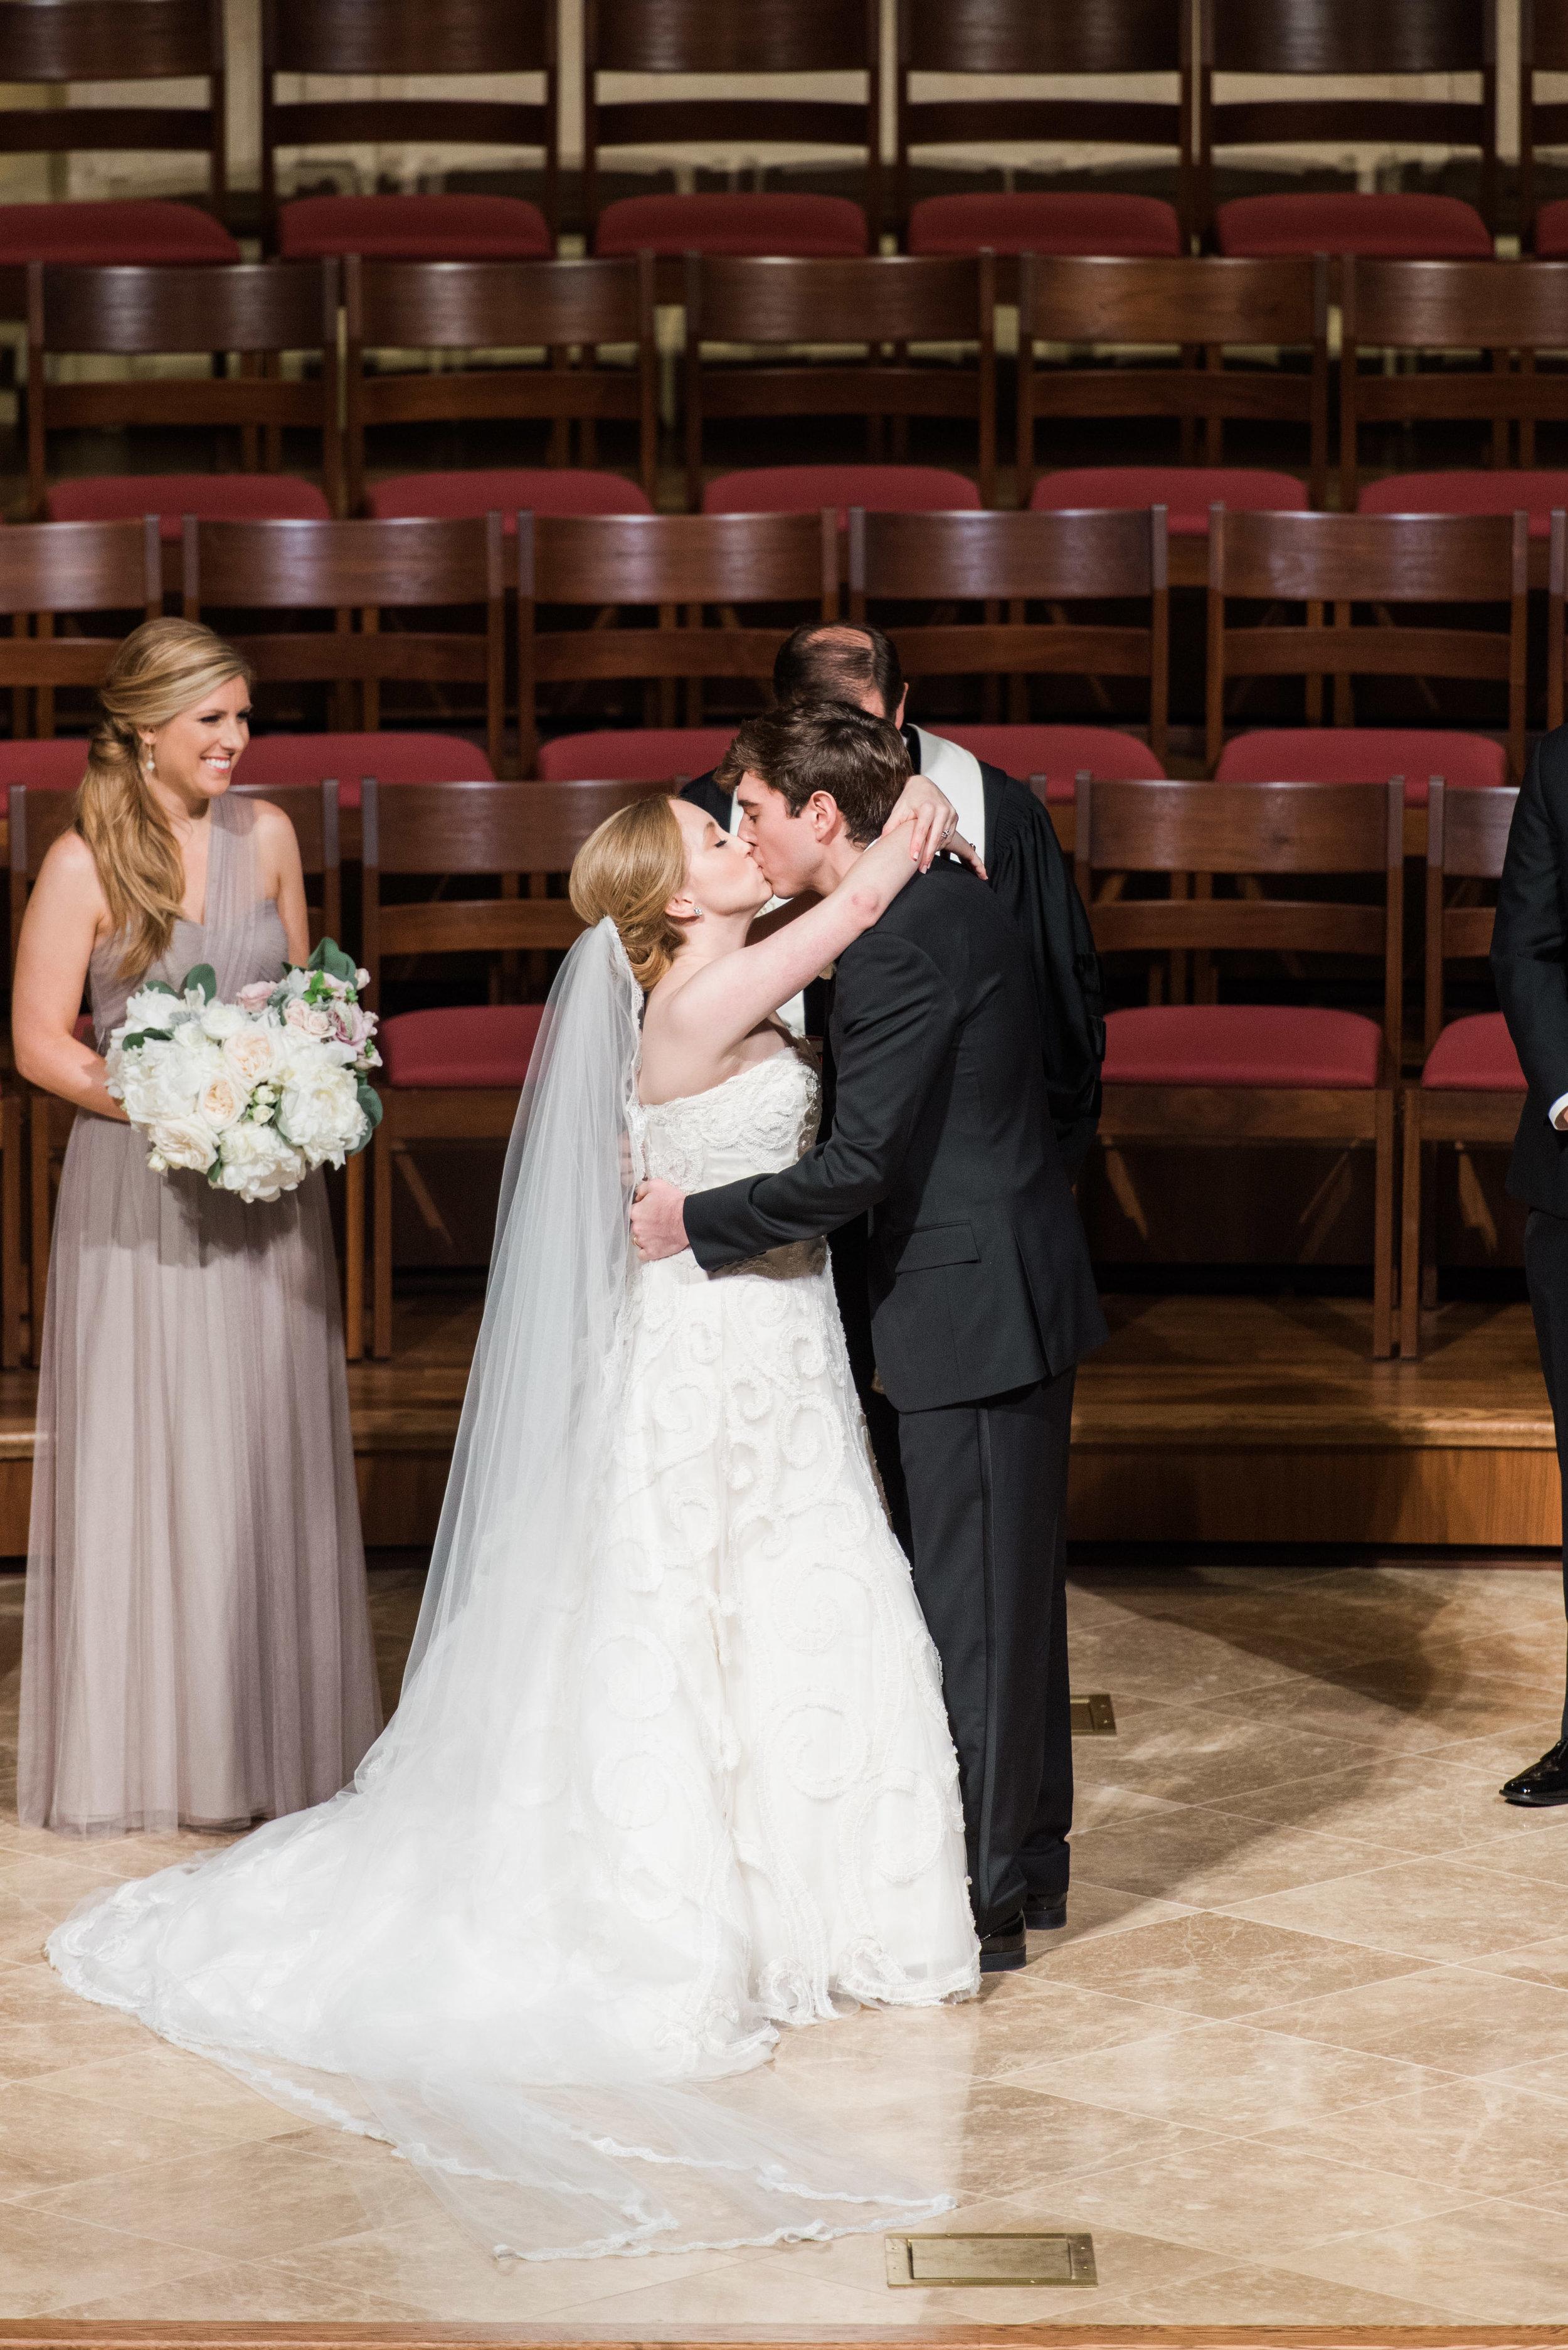 Fine-Art-Film-Houston-Wedding-Photographer-Best-Top-Luxury-Texas-Austin-Dallas-Destination-Dana-Fernandez-Photography-River-Oaks-Country-Club-South-Main-Baptist-Ceremony-Reception-Wedding-37.jpg